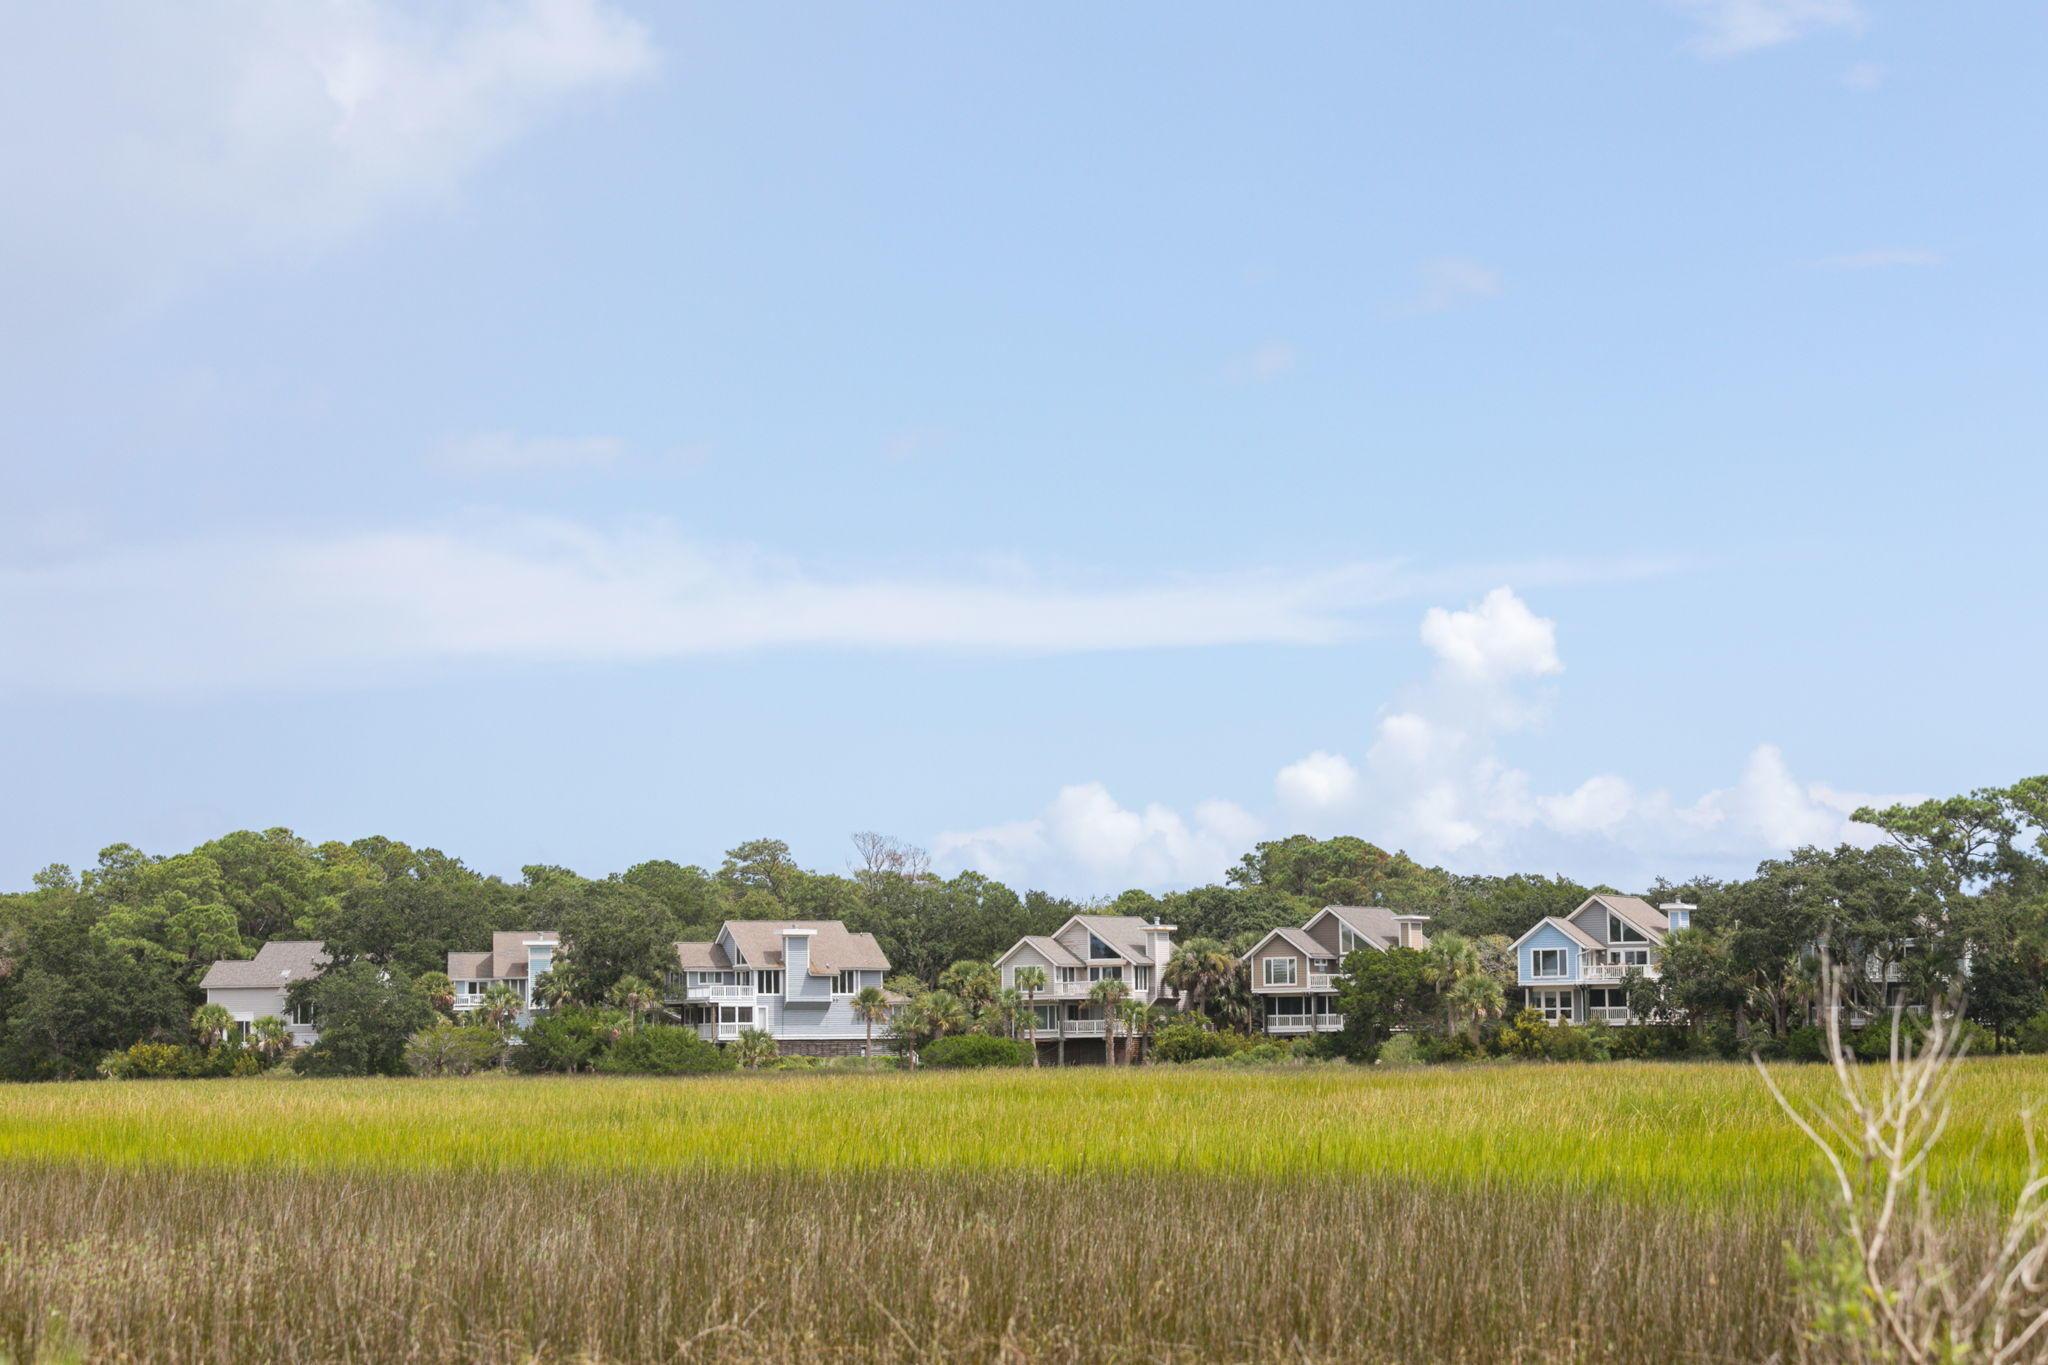 Seabrook Island Homes For Sale - 3360 Seabrook Island, Seabrook Island, SC - 20